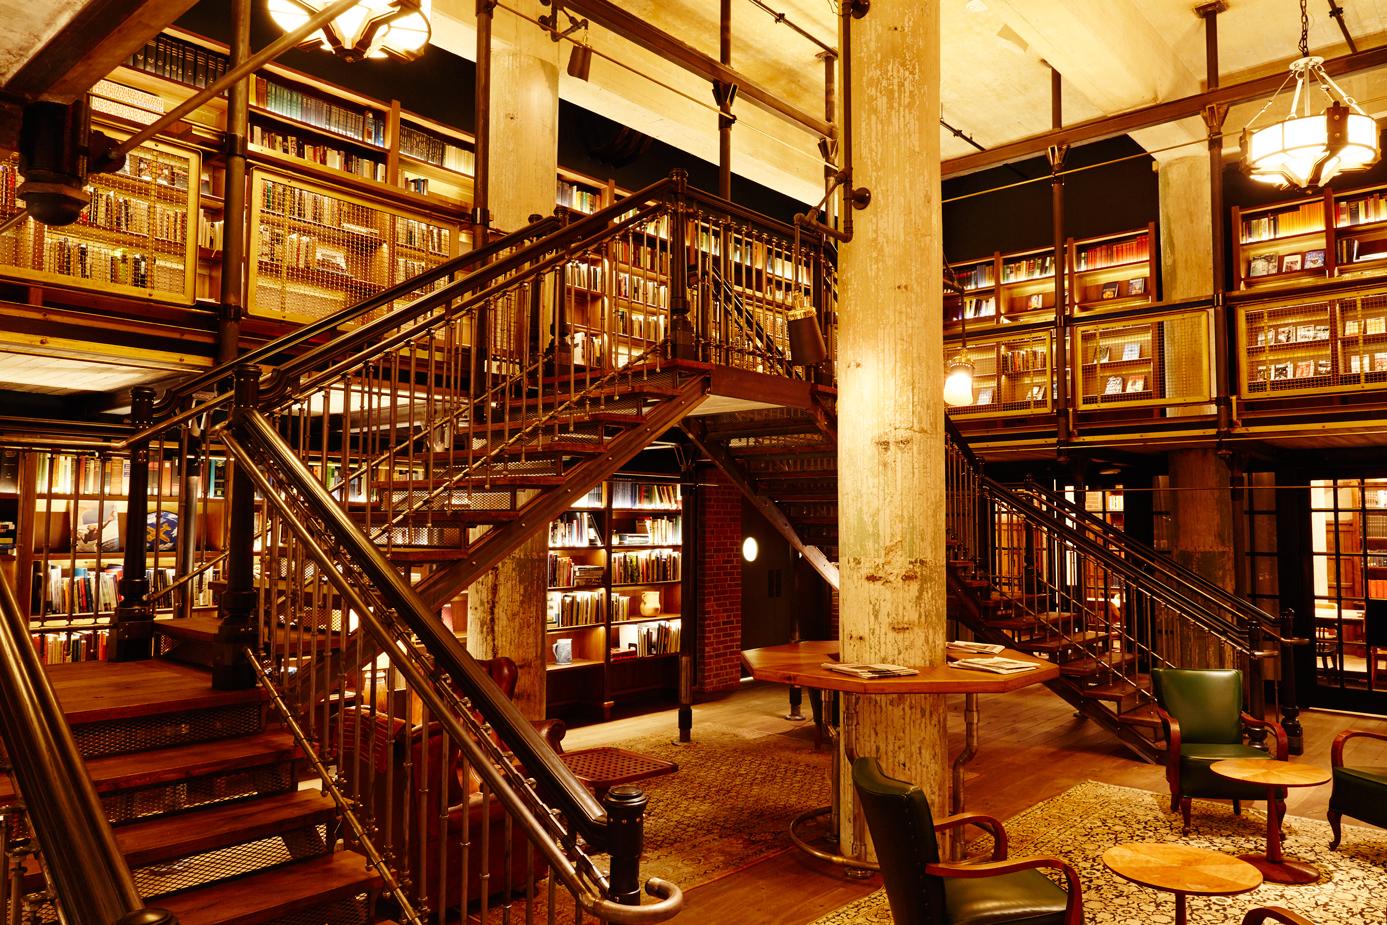 HOTEL-EMMA_LIBRARY_NICOLE-FRANZEN_0063-(10)_web.jpg